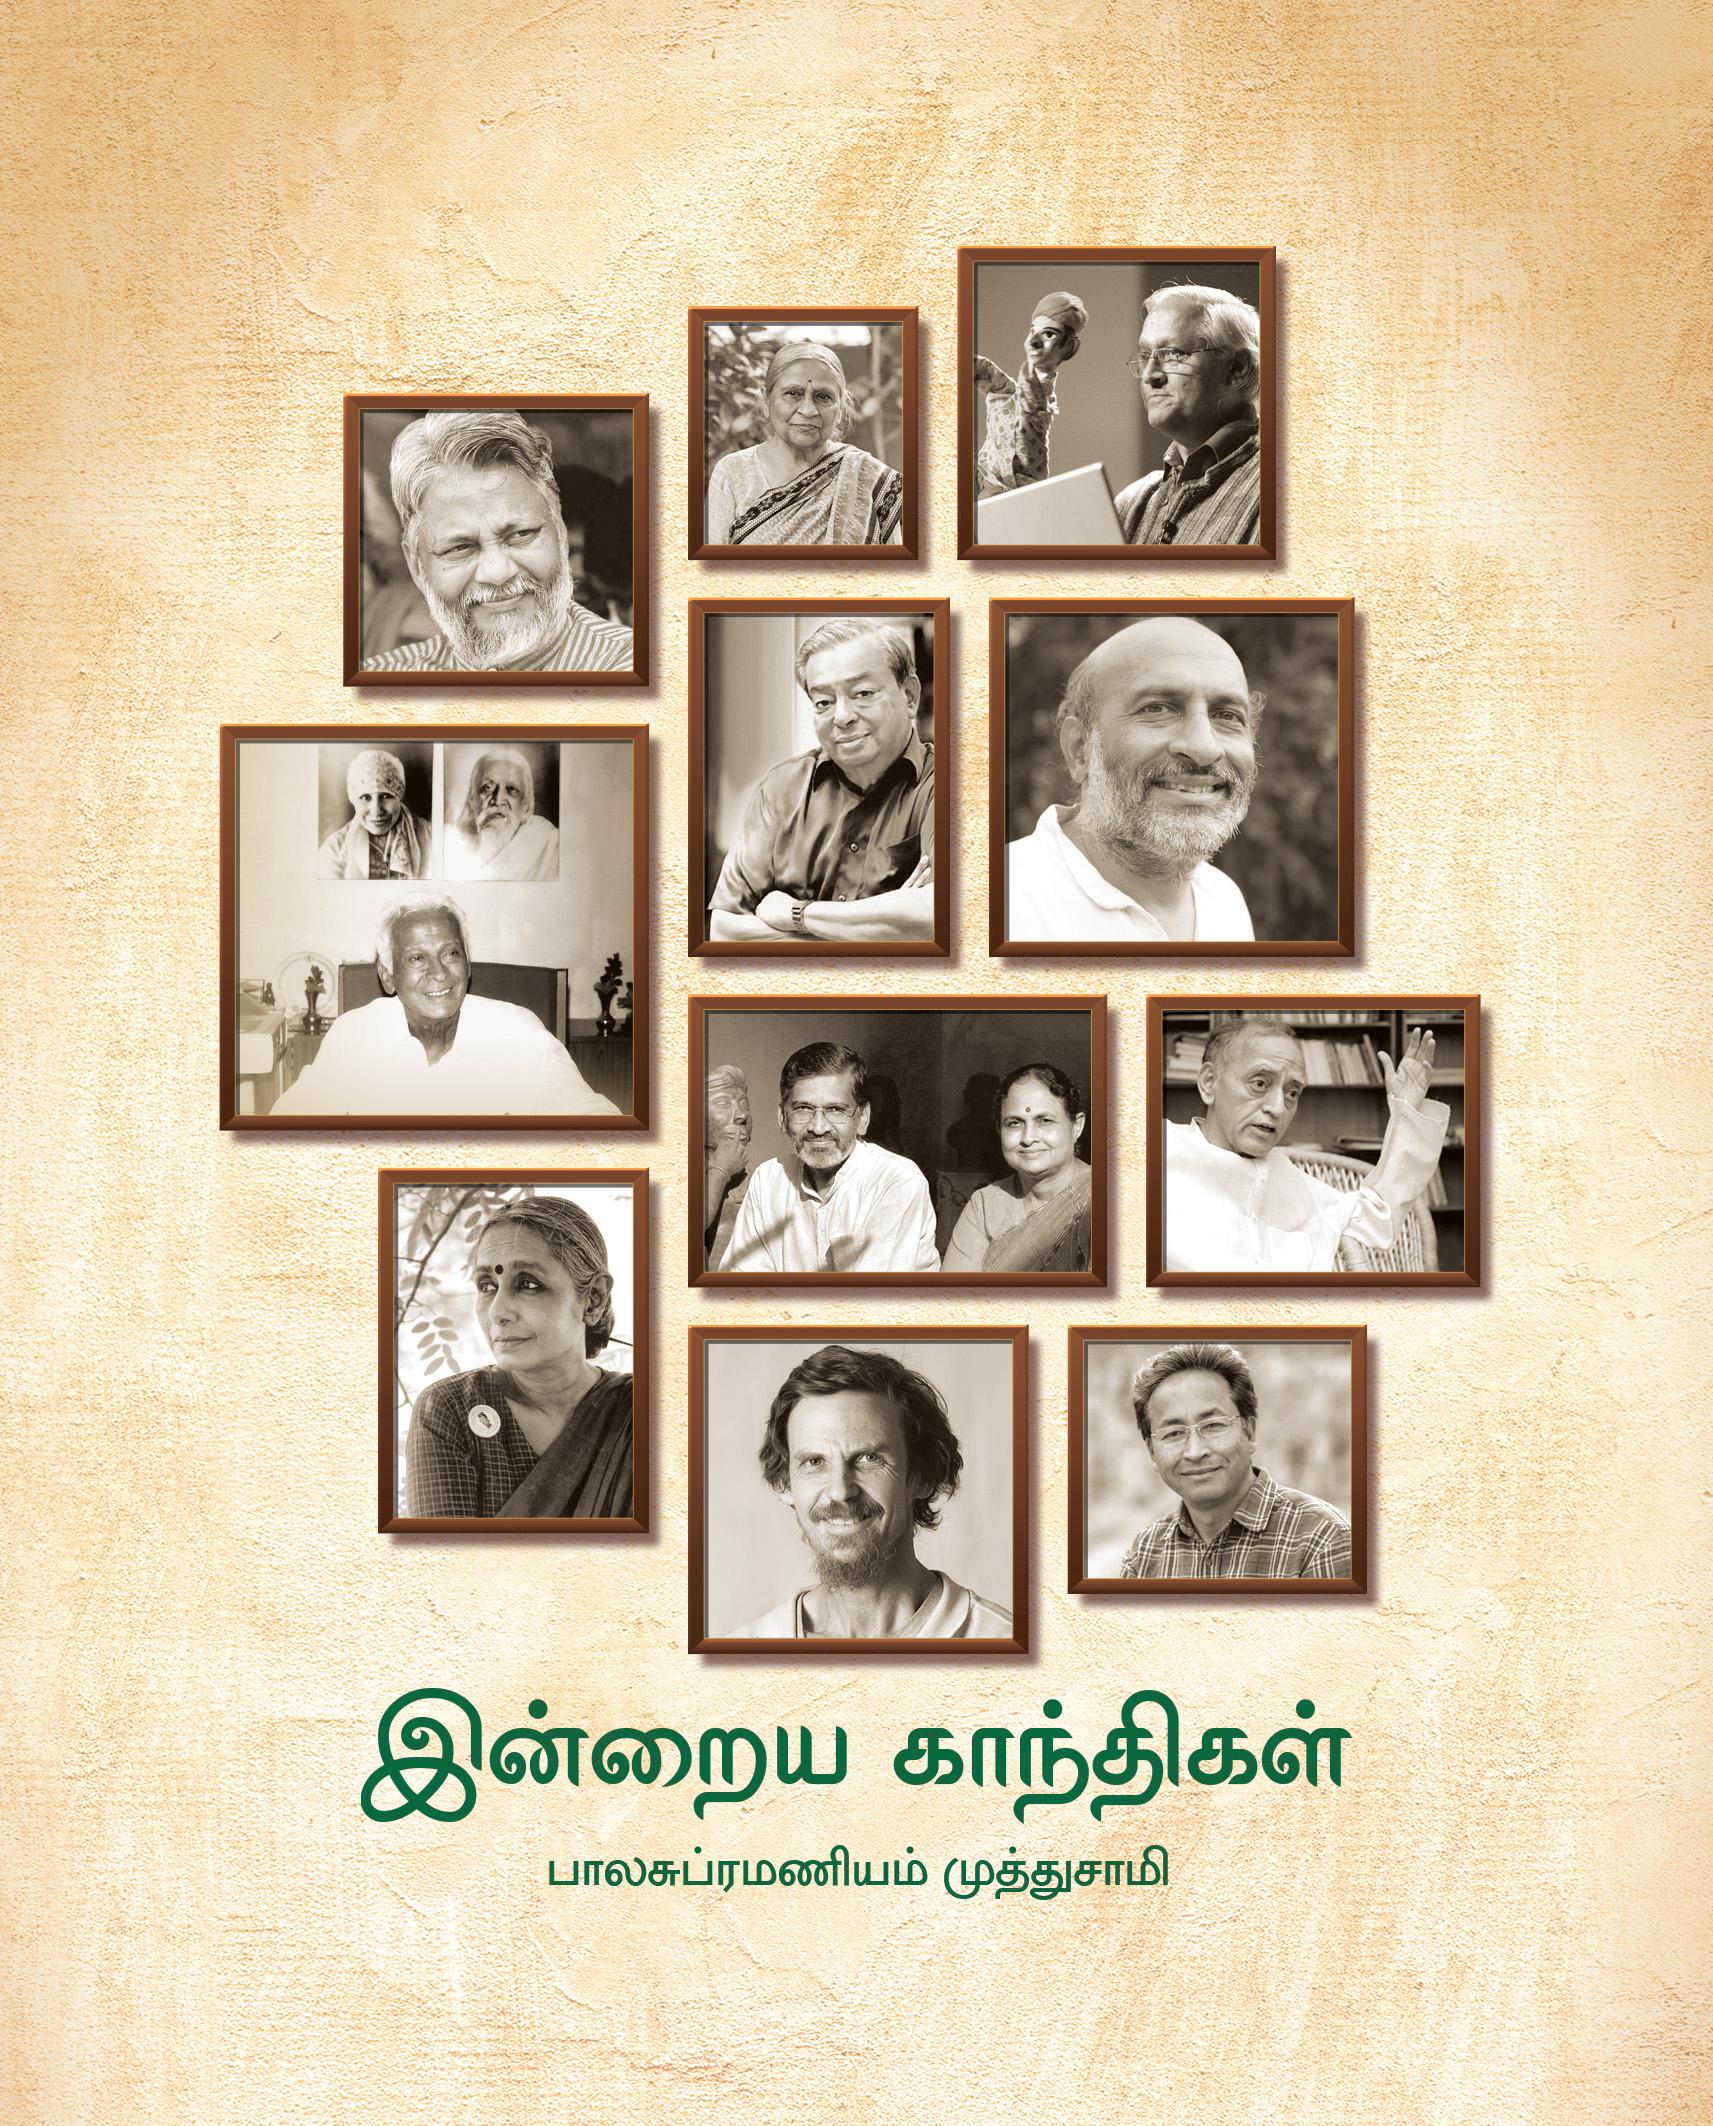 https://thannaram.in/wp-content/uploads/2019/10/Indraya-Gandhigal-Book-Wrapper-FIN.jpg